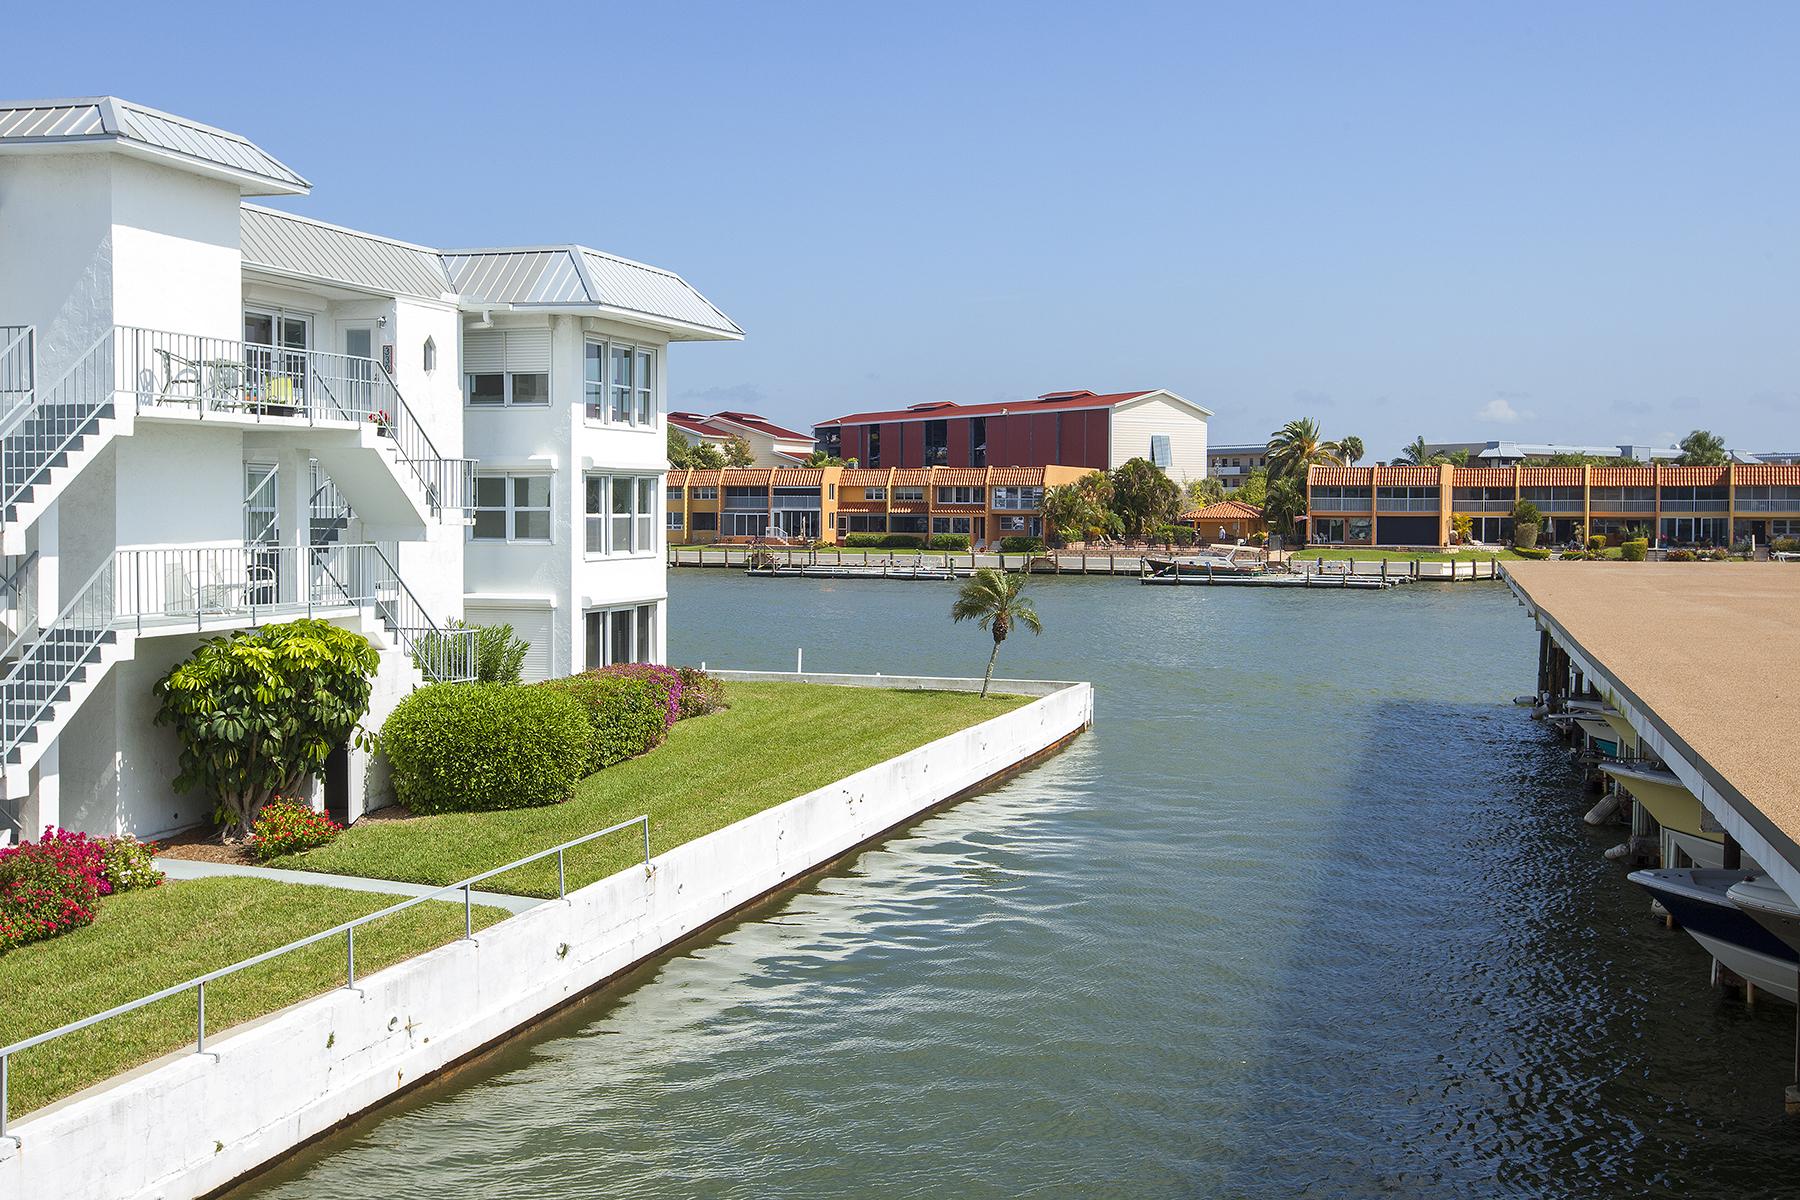 Condomínio para Venda às 1100 8th Ave S, 227H, Naples, FL 34102 1100 8th Ave S 227H Naples, Florida 34102 Estados Unidos